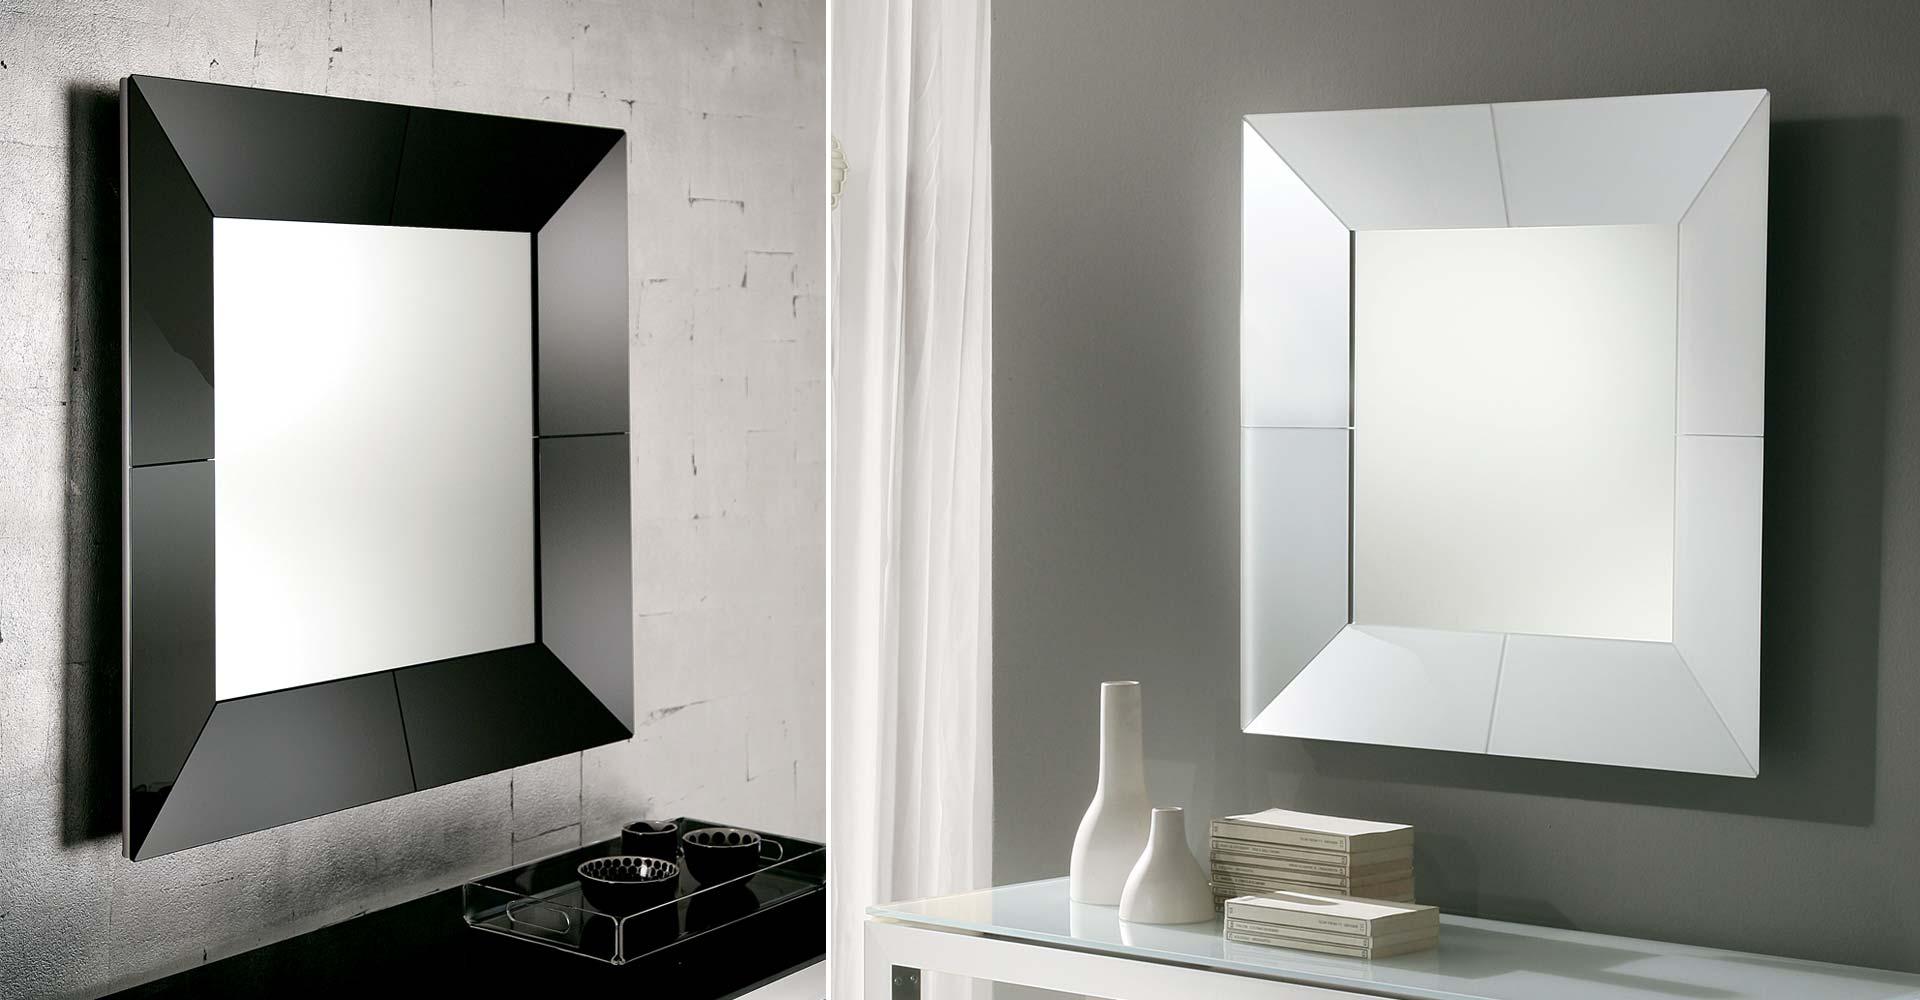 specchio gigante archivi consolle tavoli riflessi